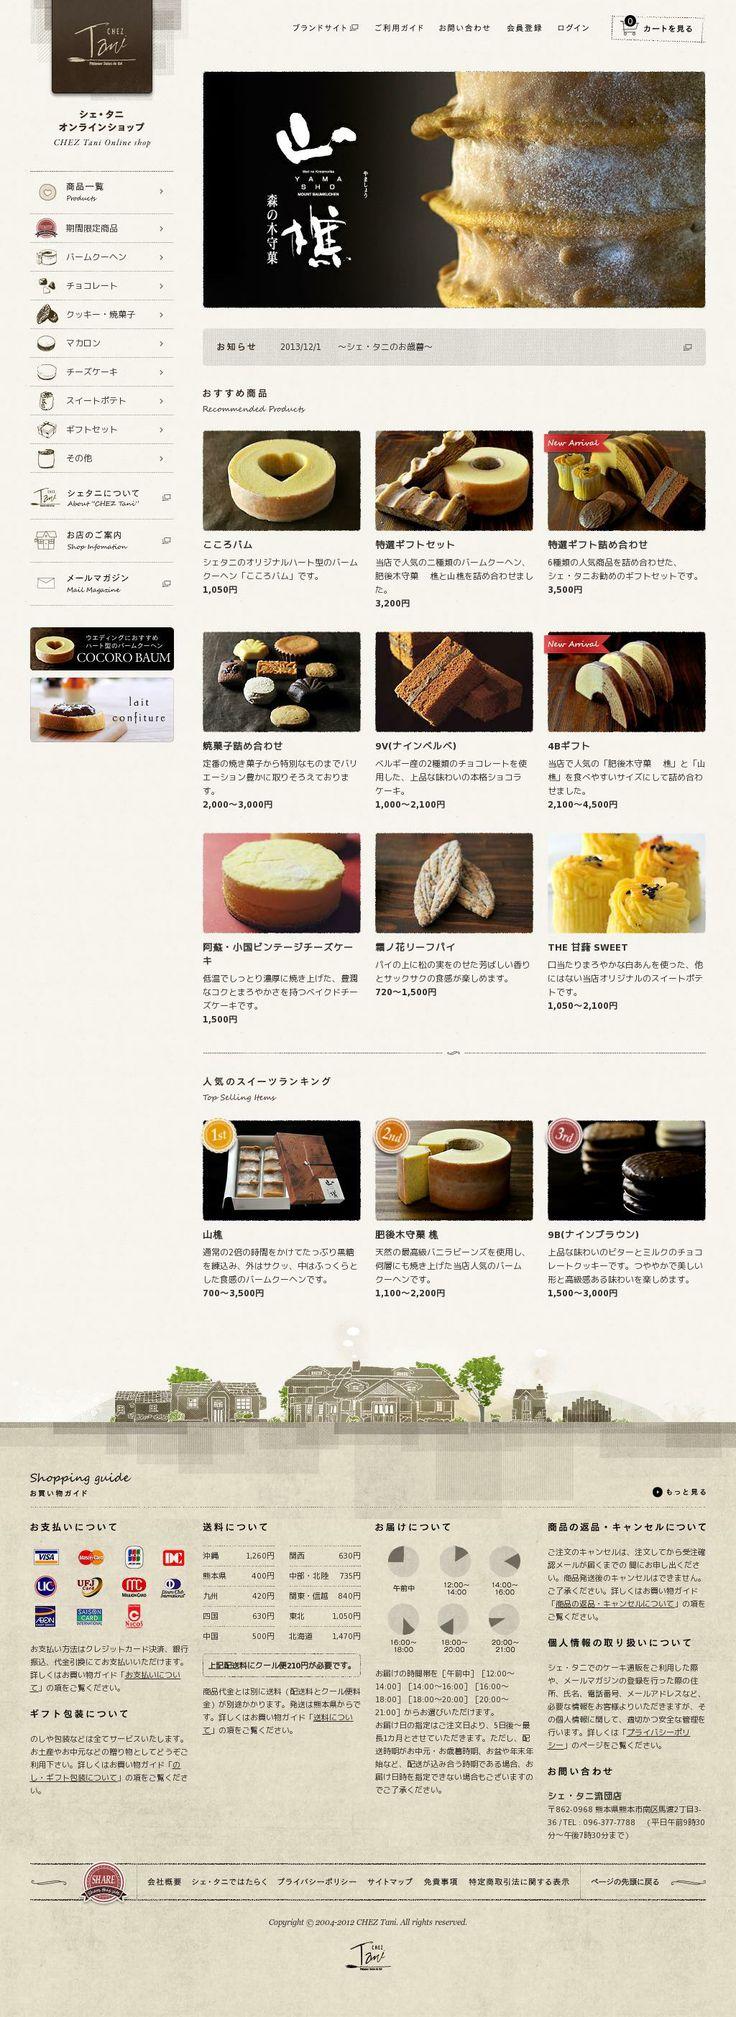 The website 'http://shop.chez-tani.com/' courtesy of @Pinstamatic (http://pinstamatic.com)